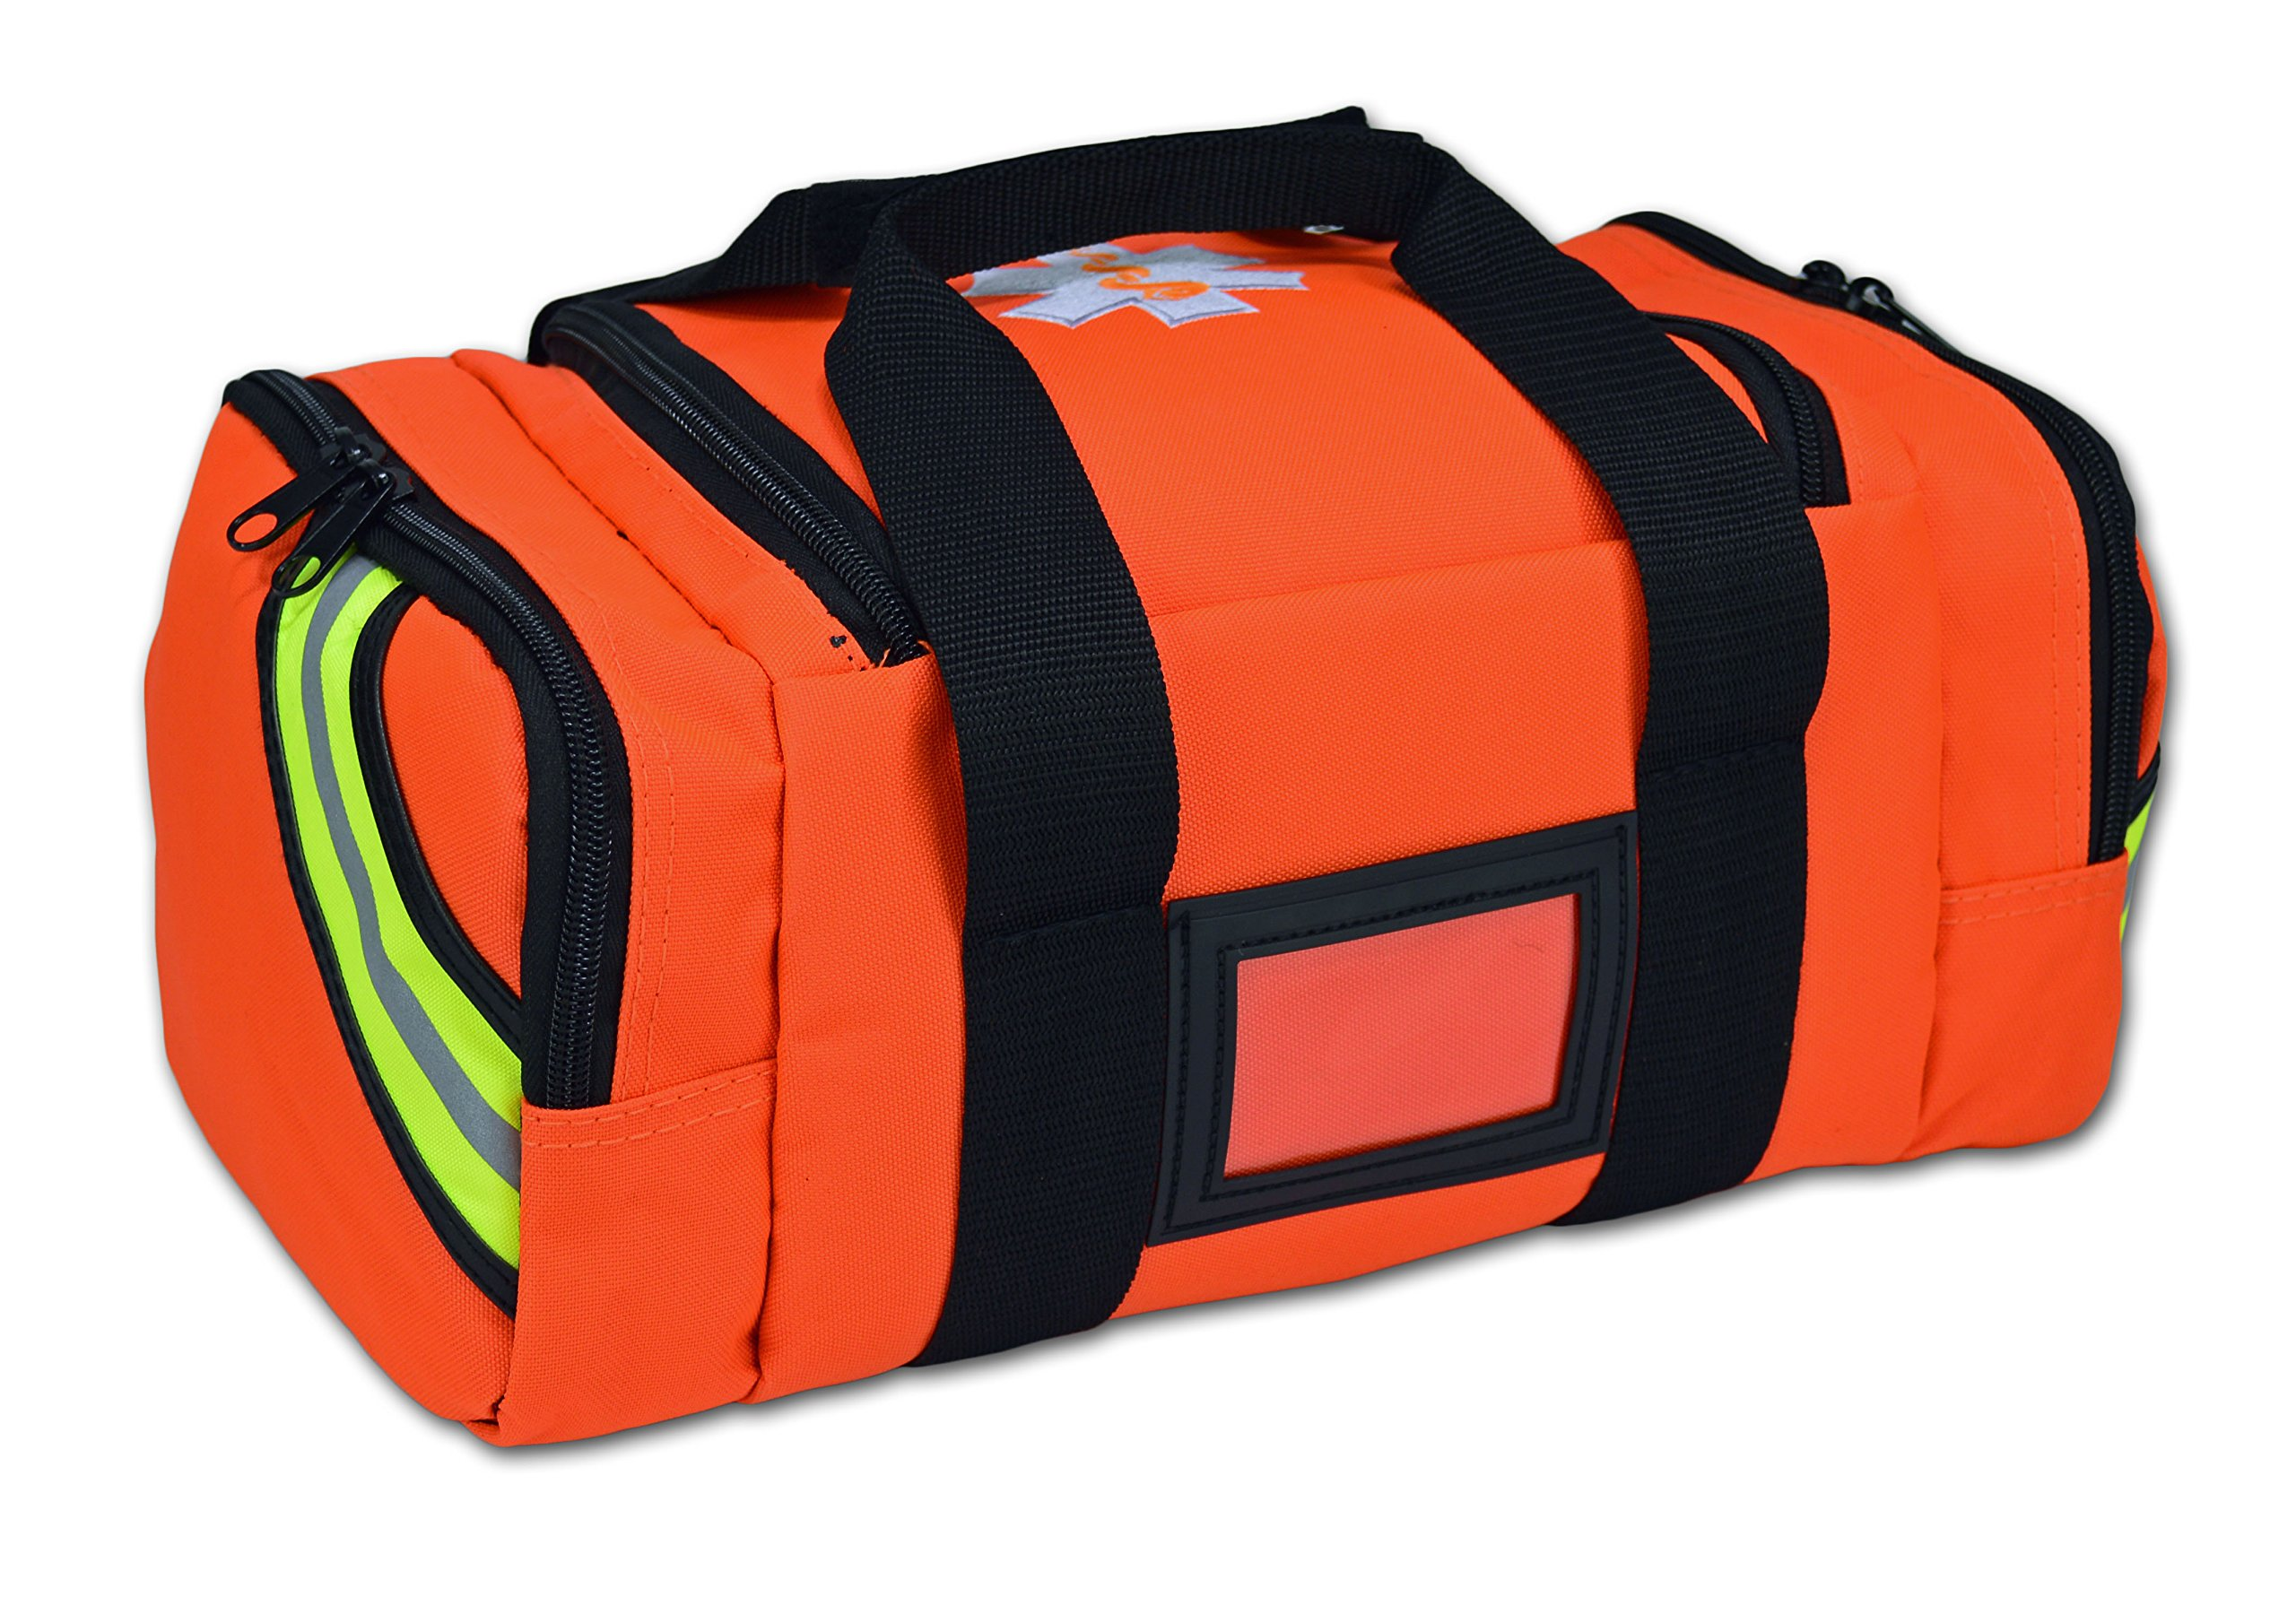 Lightning X Value Compact Medic First Responder EMS/EMT Stocked Trauma Bag w/Standard Fill Kit B - Orange by Lightning X Products (Image #2)